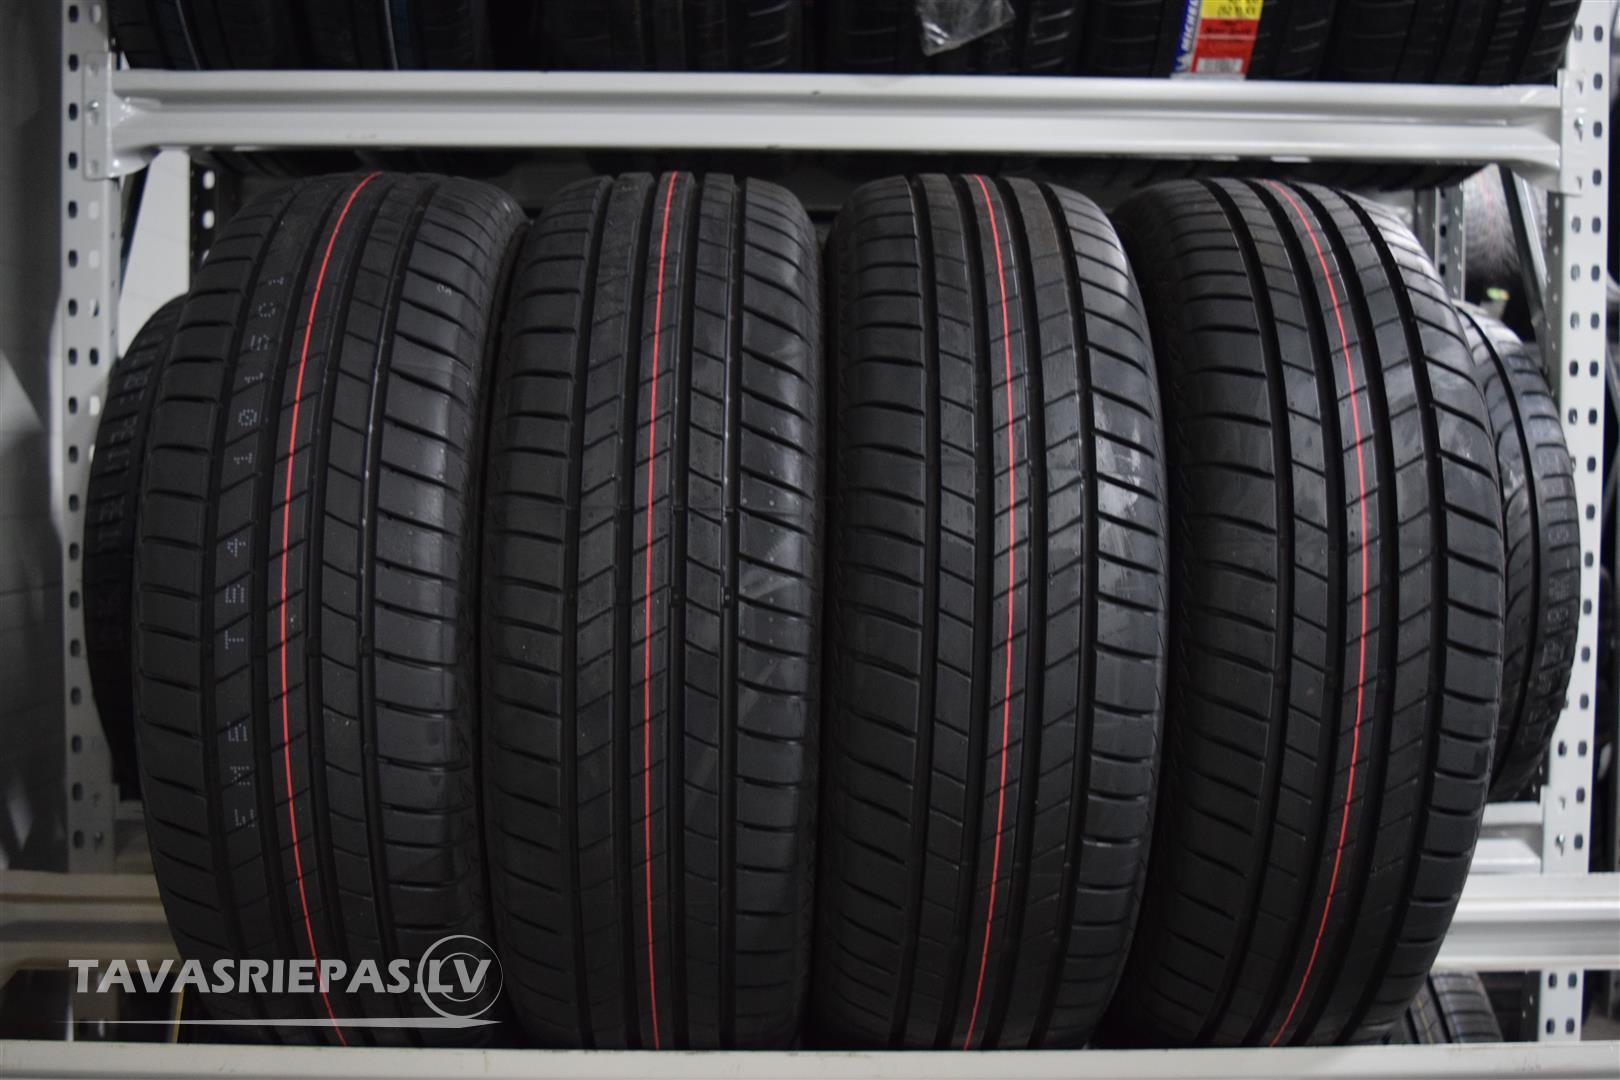 Efterstræbte Tires Bridgestone Turanza T005 195/65 R15 UQ-89